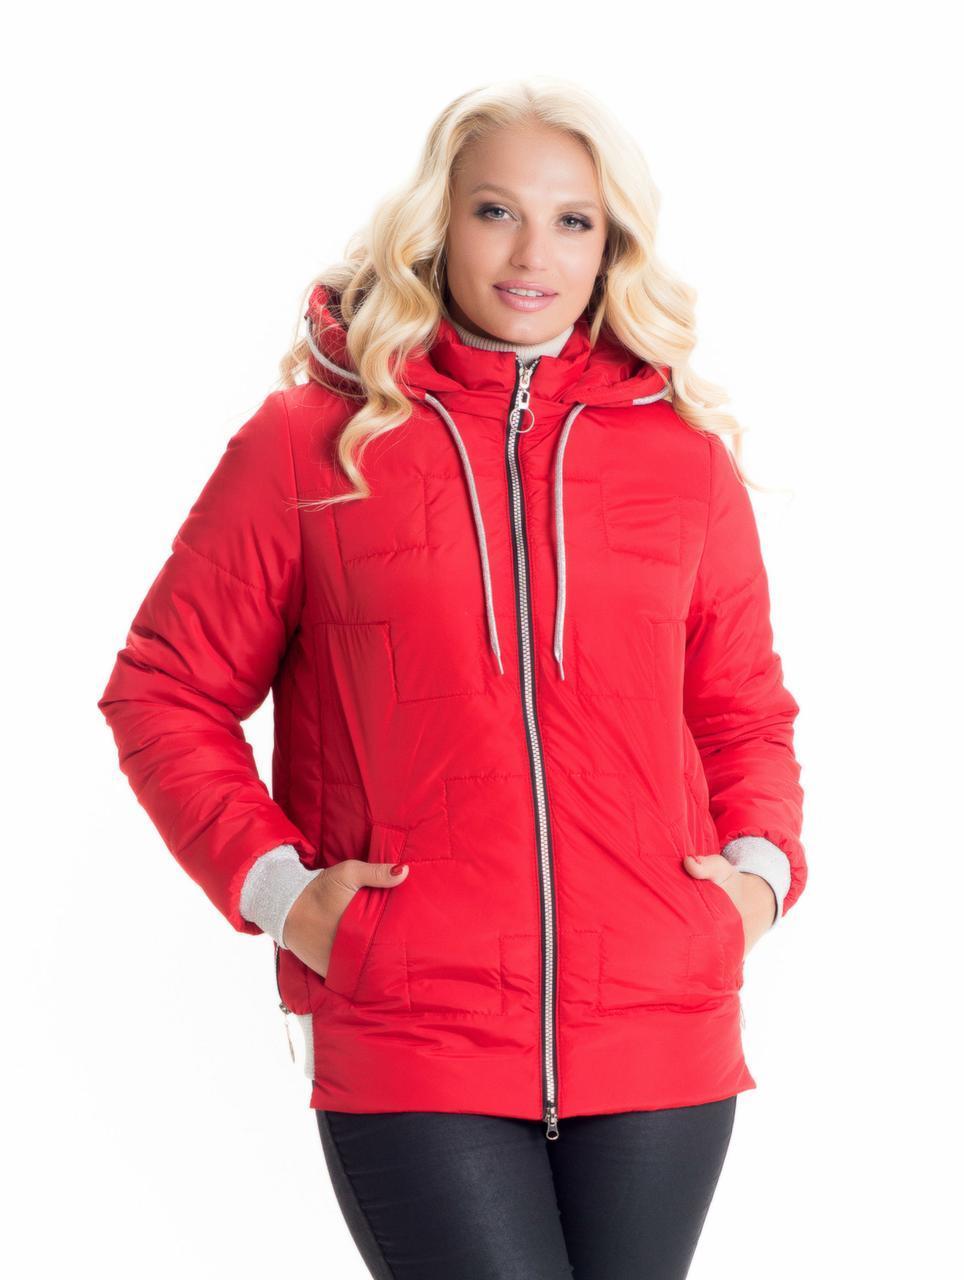 Модная короткая красная куртка